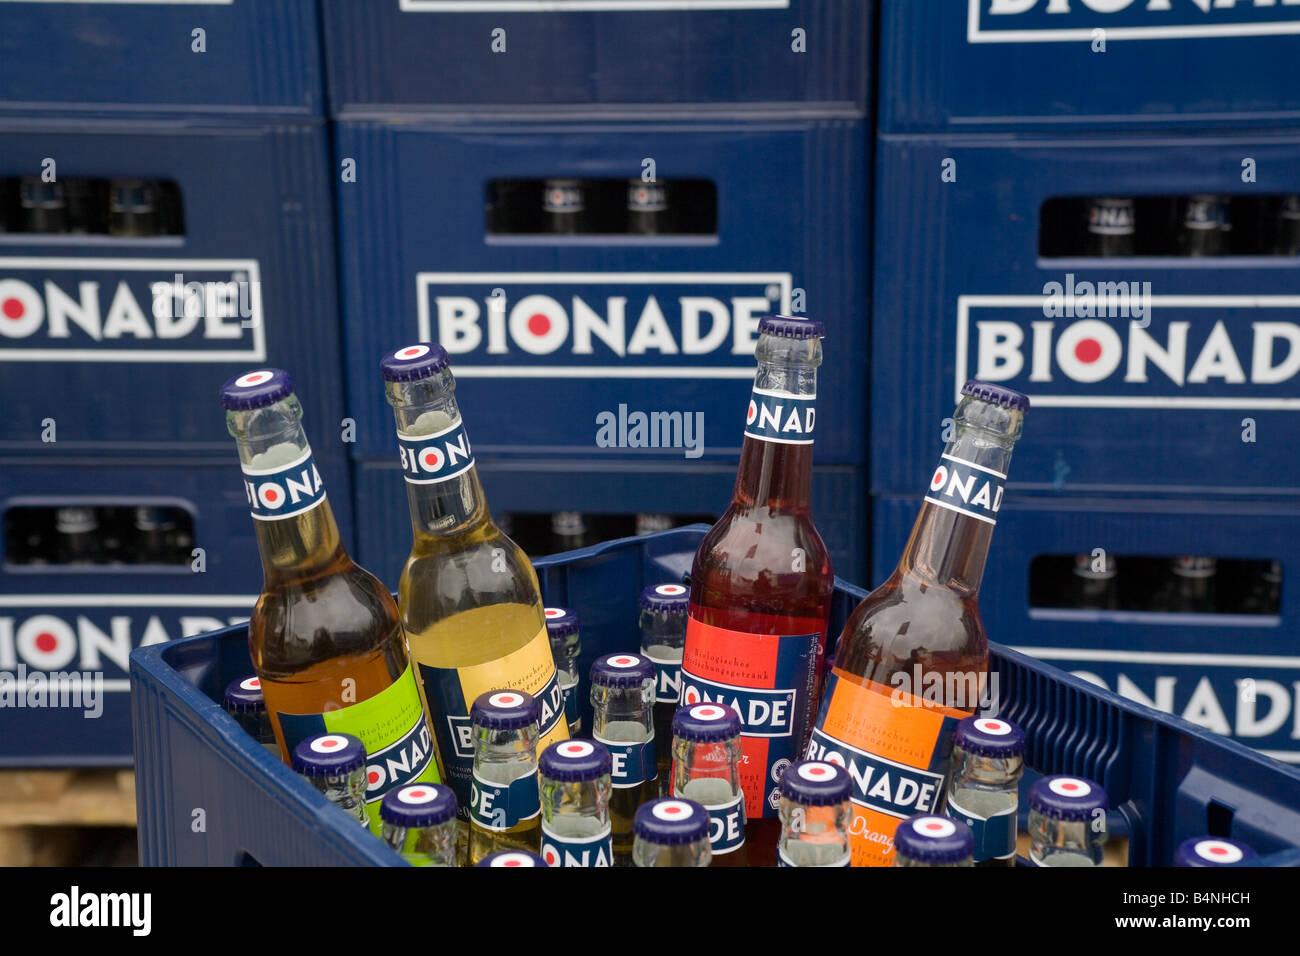 BIONADE GmbH production de l'alcool biologique boisson Bionade libre Photo Stock